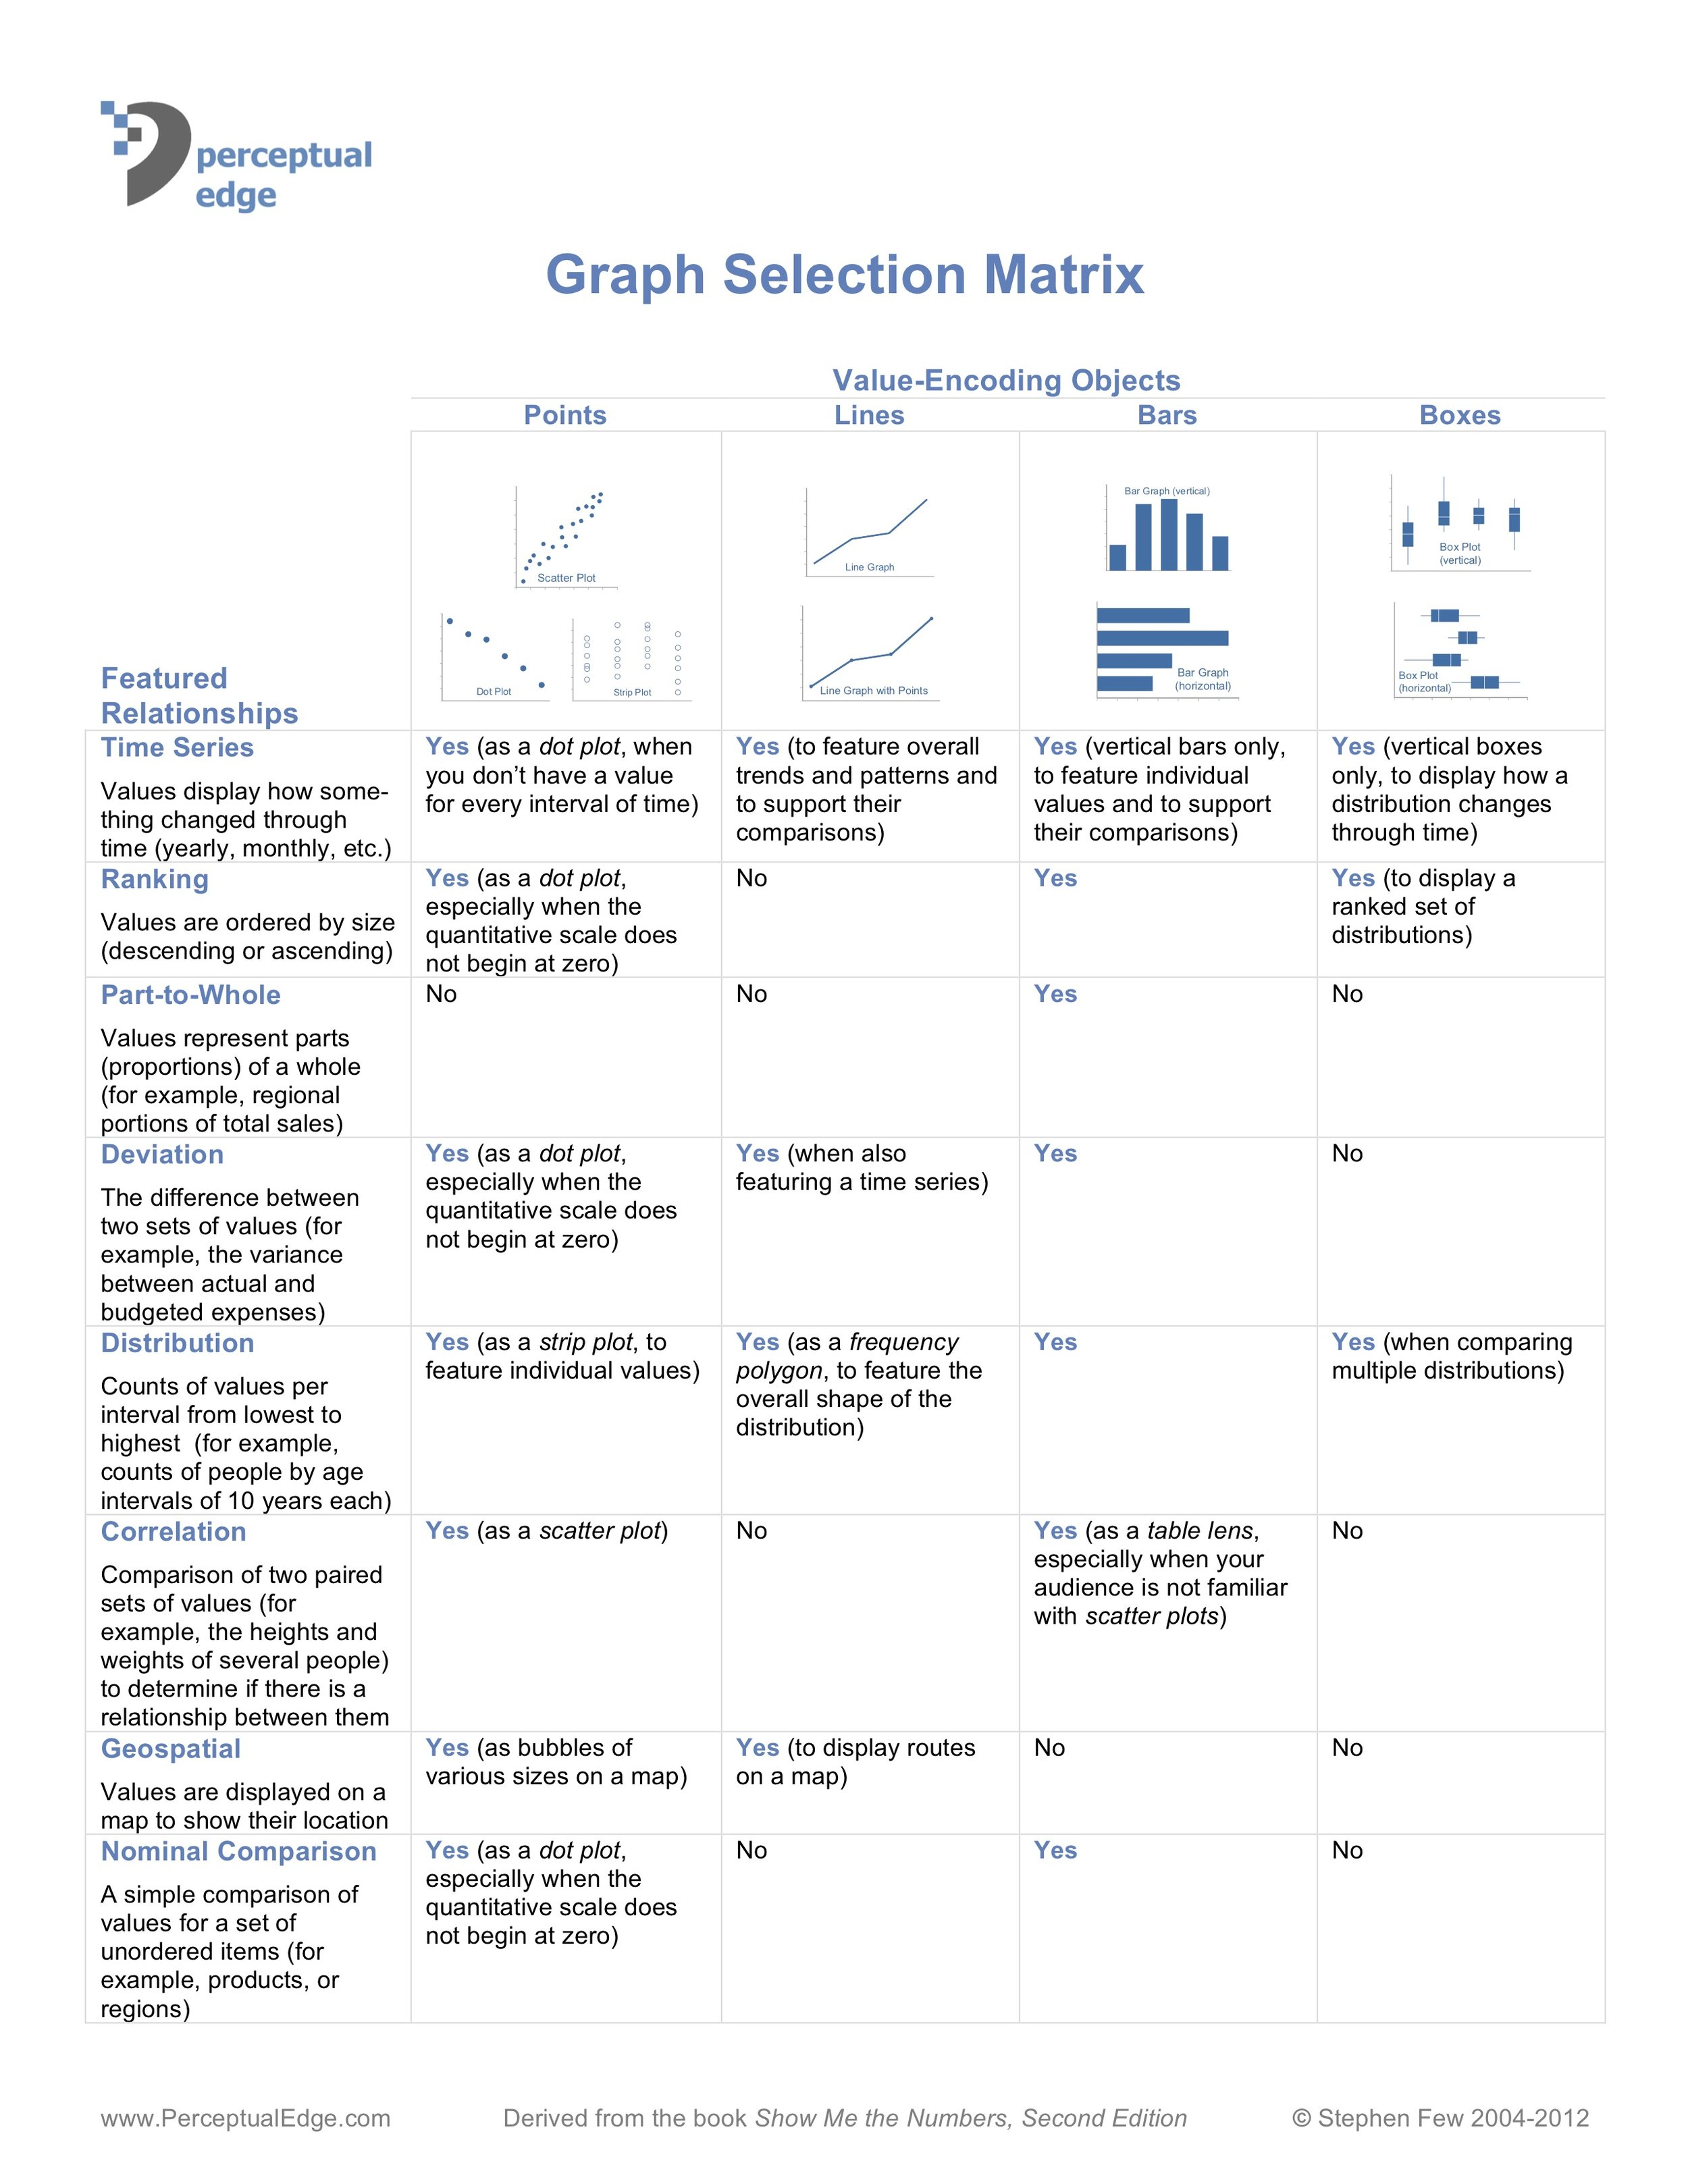 Effective-Chart-Design-Stephen-Few.jpg